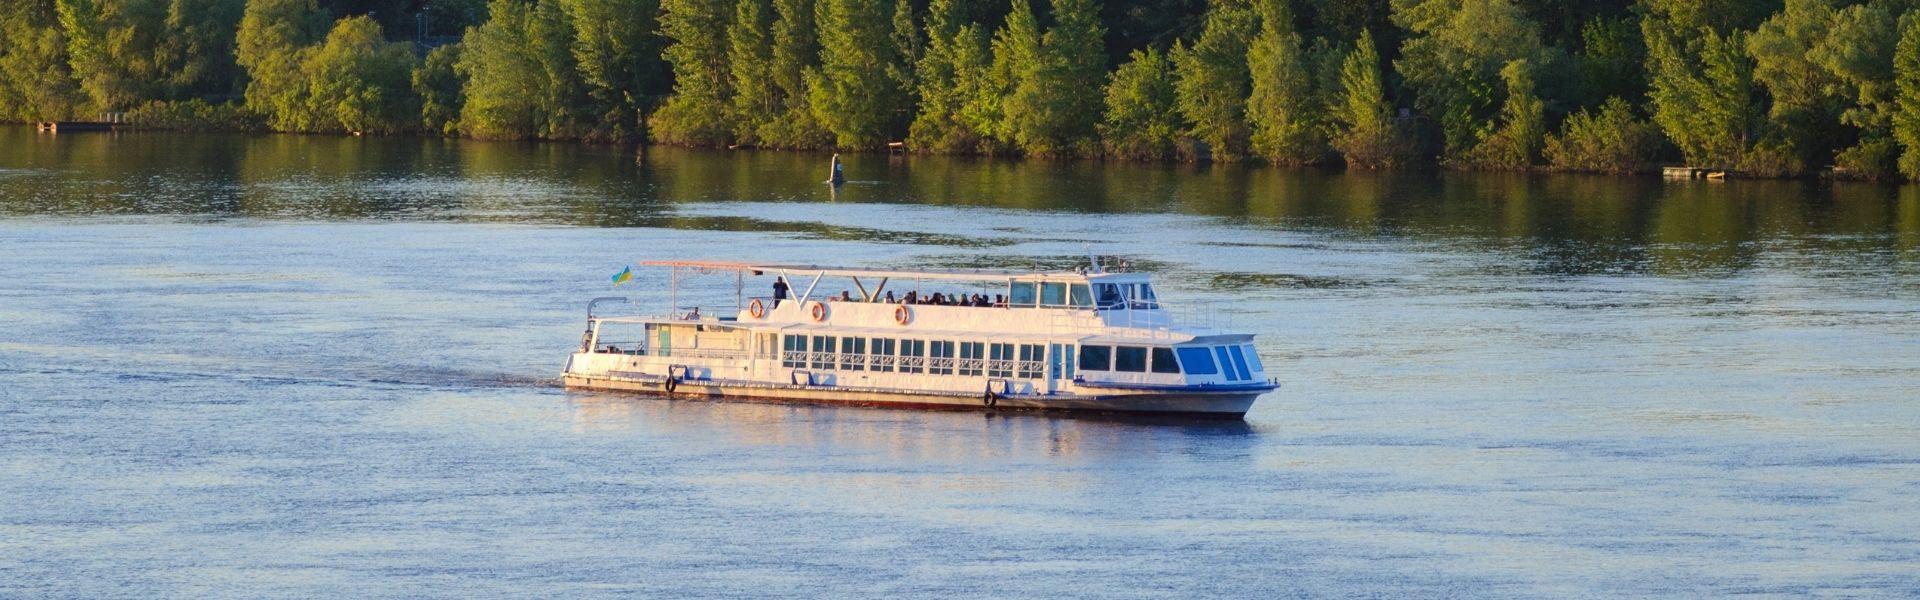 Аренда катера «Очаков» в Херсоне